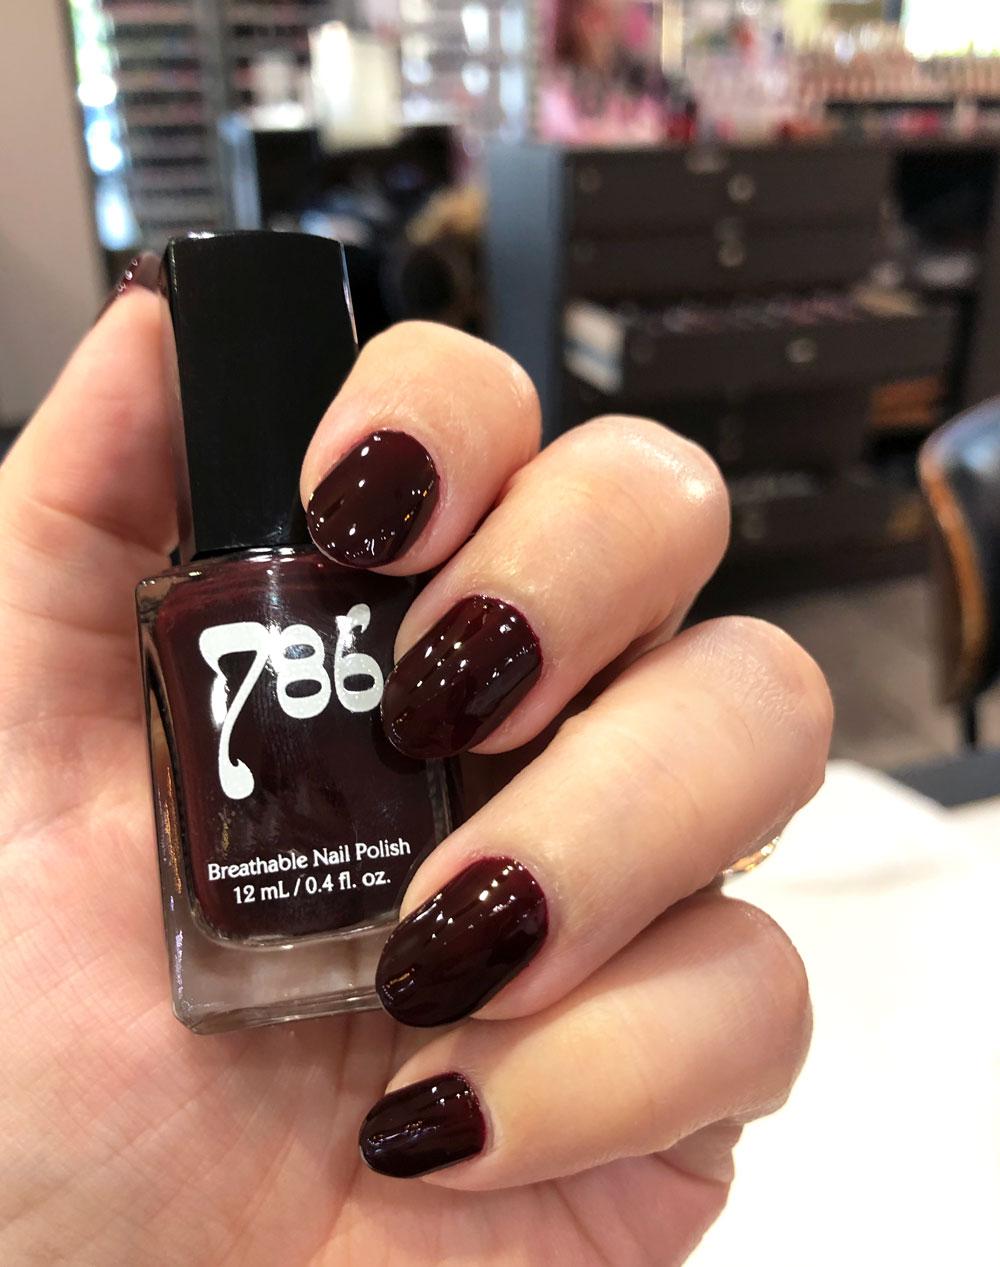 786 halal vegan cruelty free nail polish - dark burgundy Istanbul